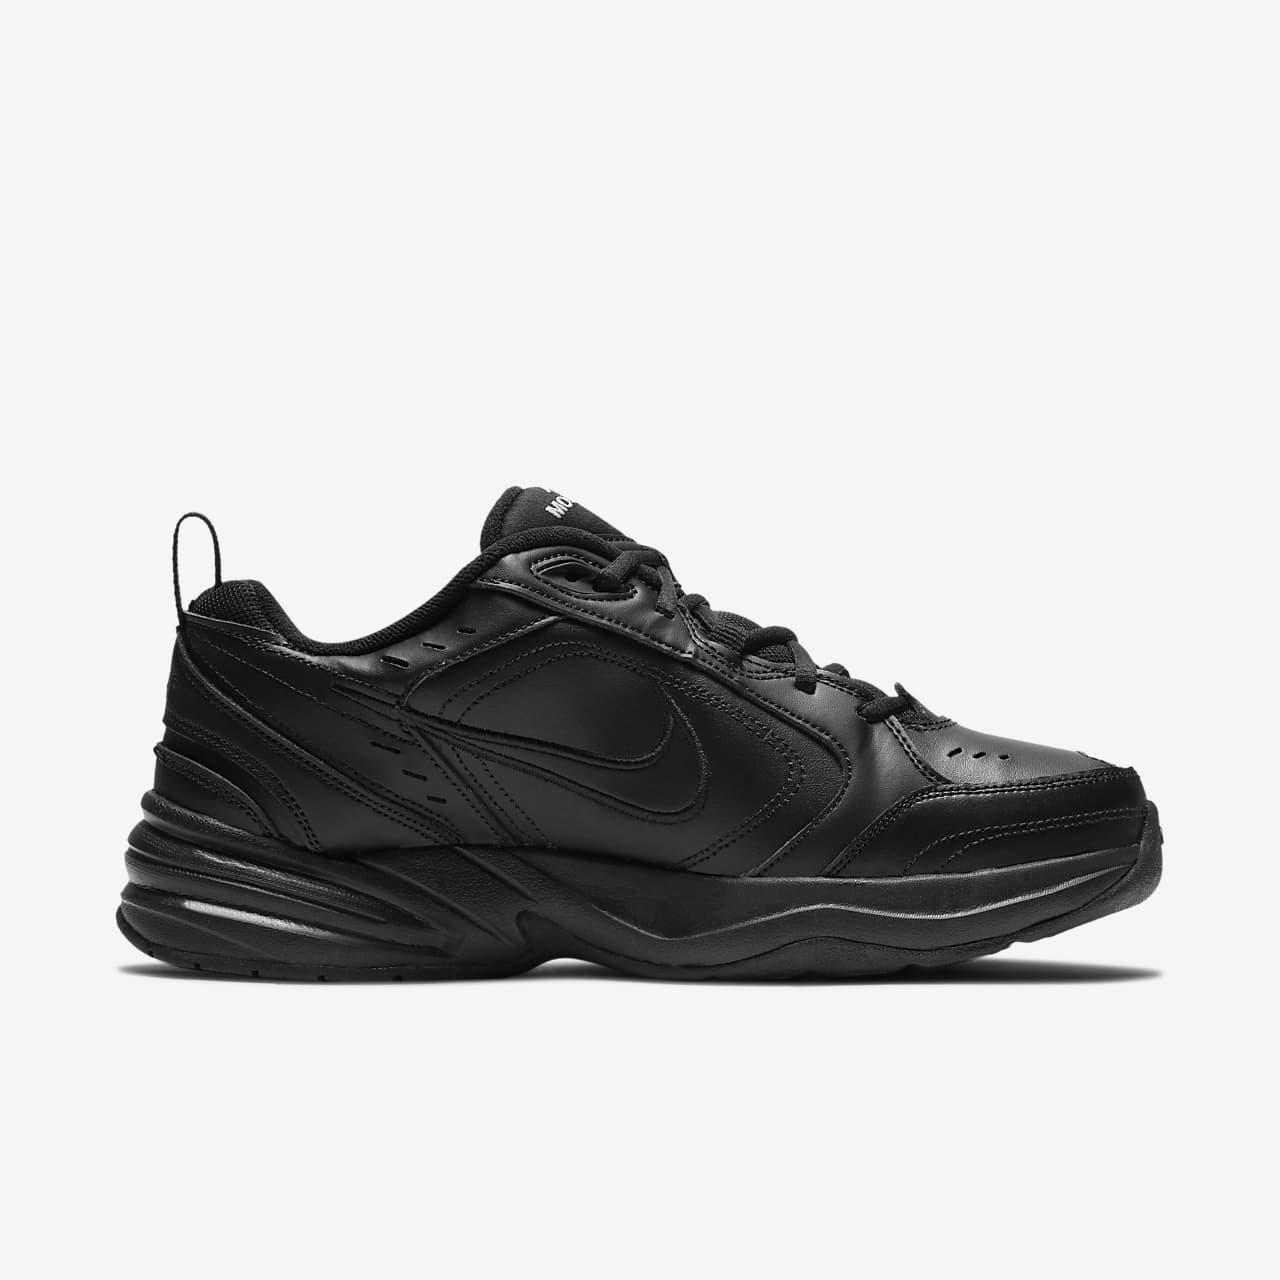 promo code ae605 d1651 Lifestyle Gym Shoe. Nike Air Monarch IV